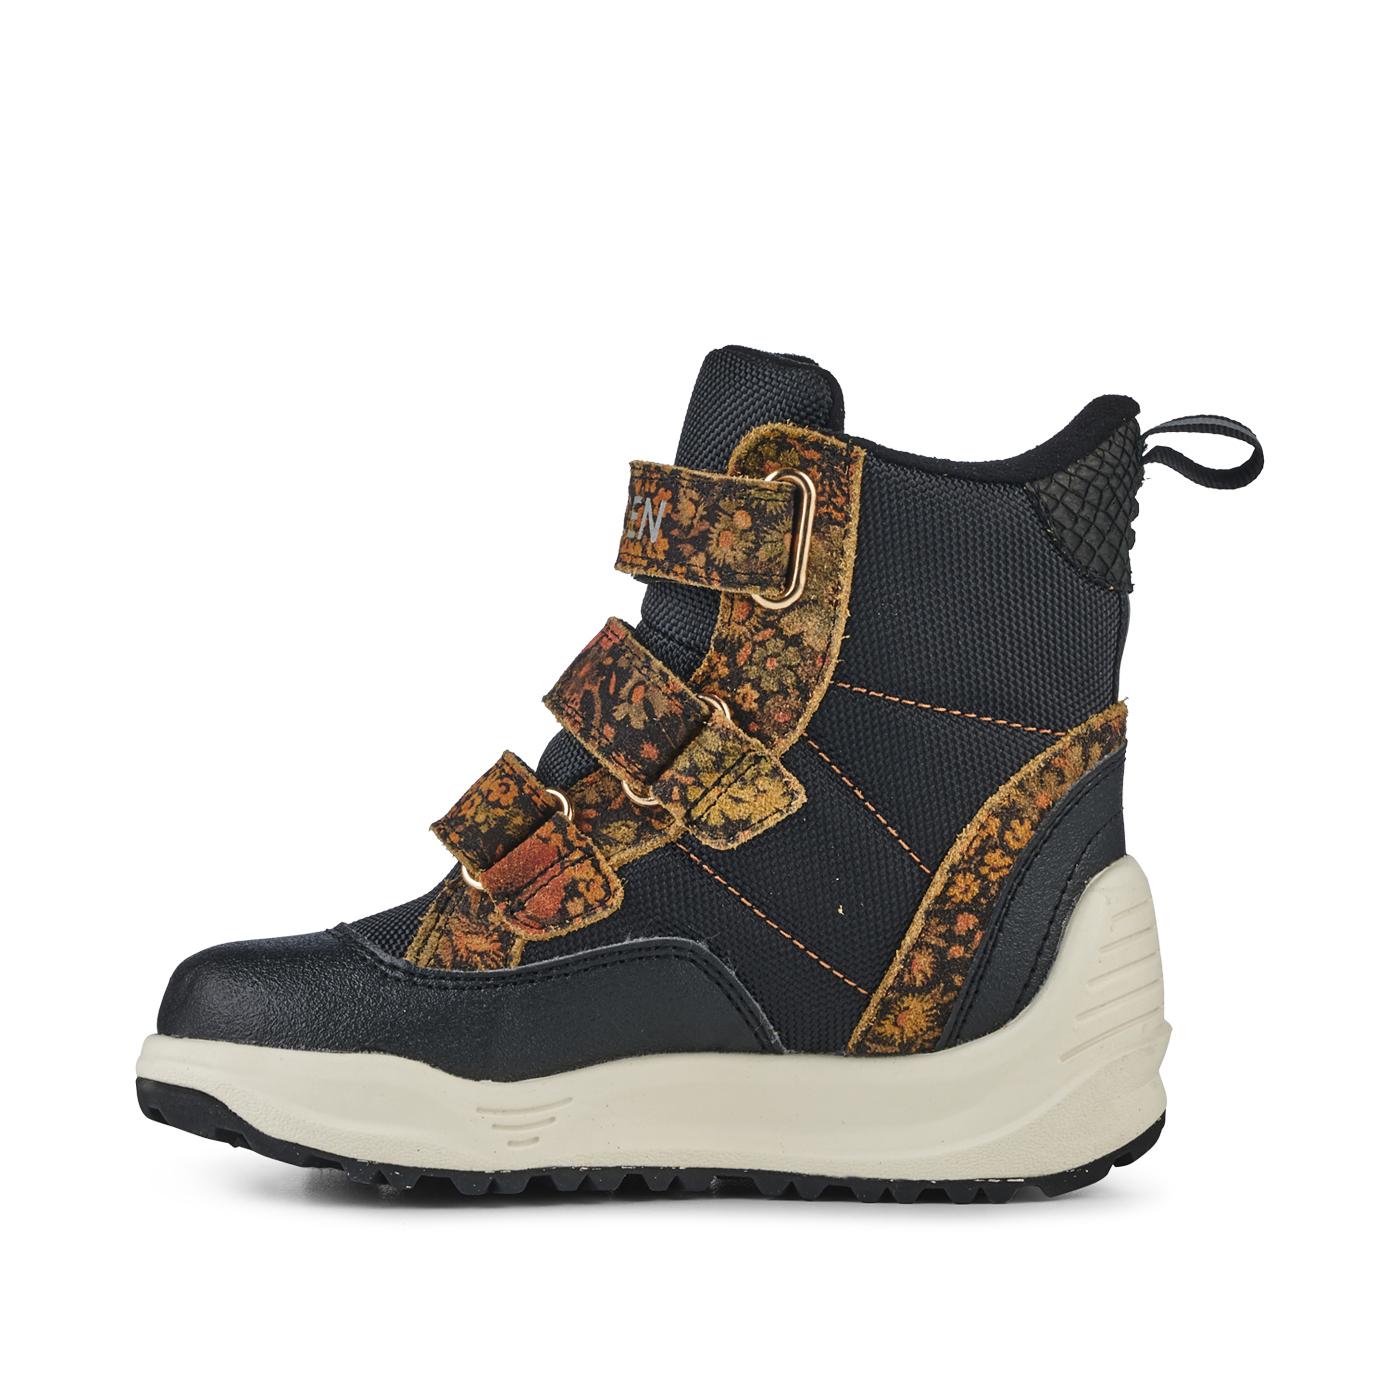 Woden WK9052 Boots 27 422